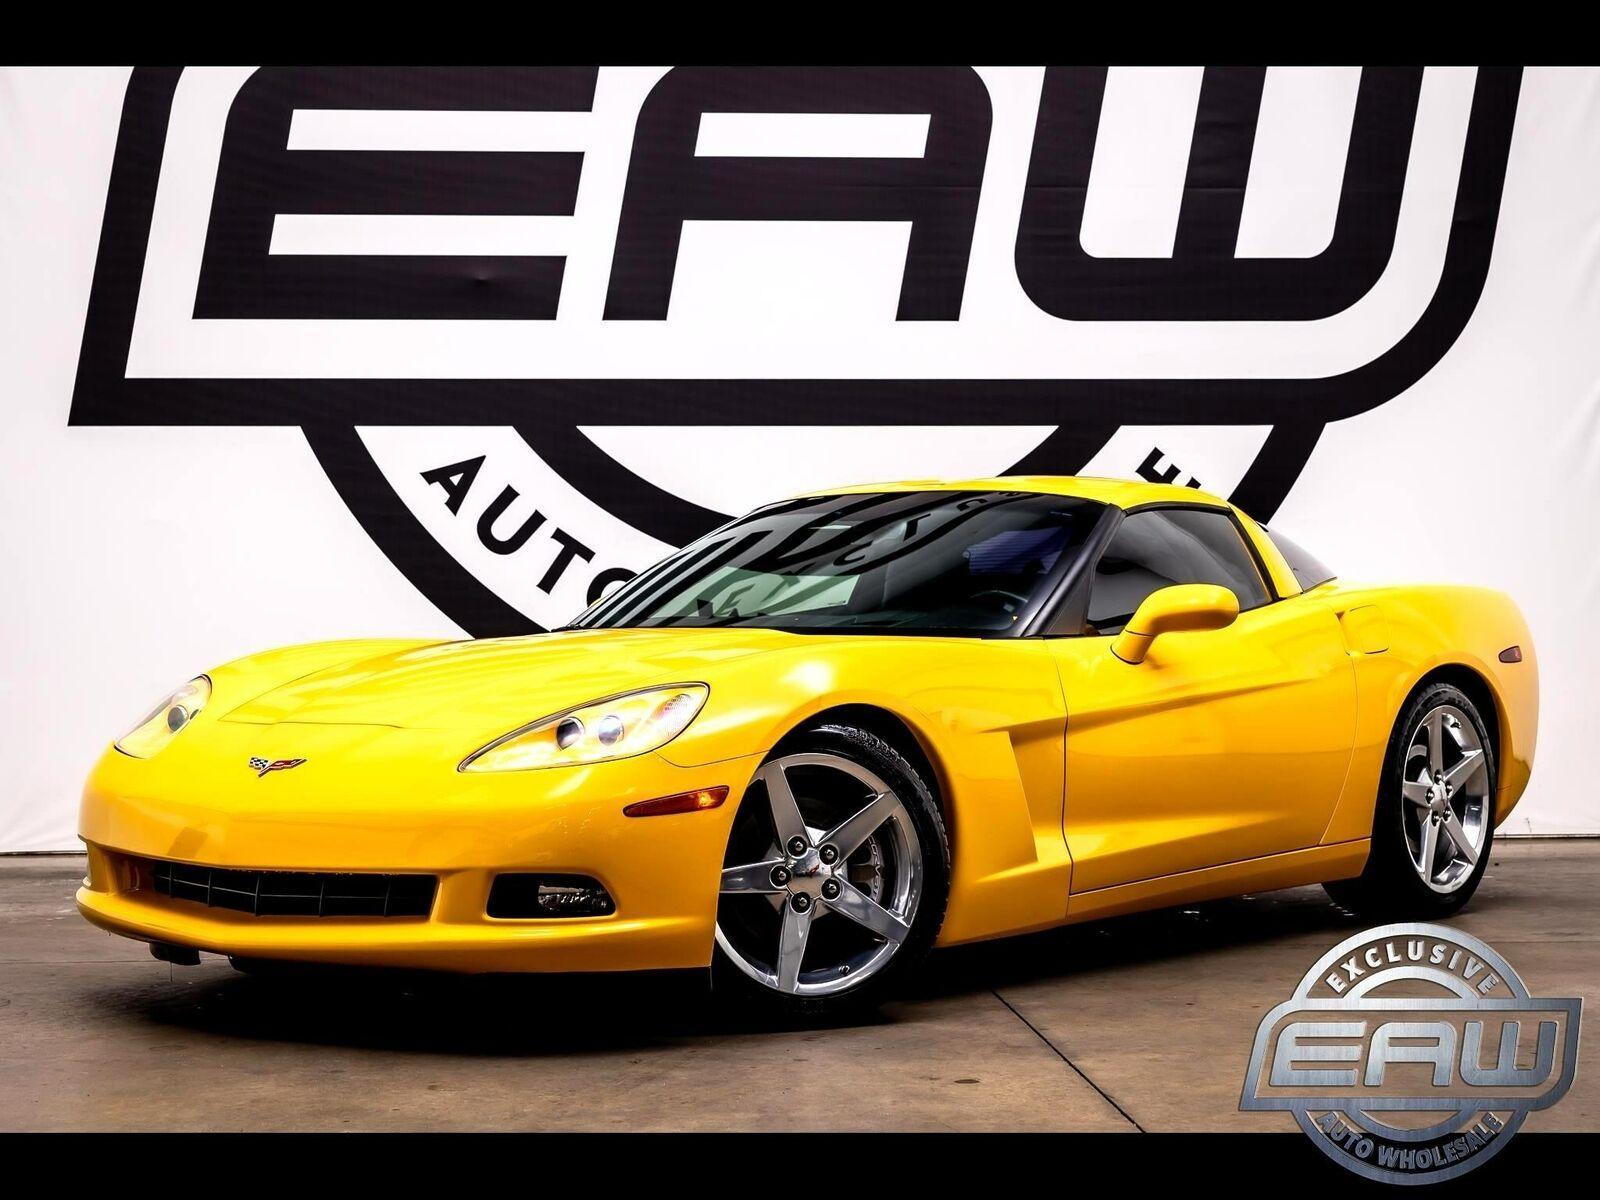 2005 Yellow Chevrolet Corvette Coupe  | C6 Corvette Photo 1